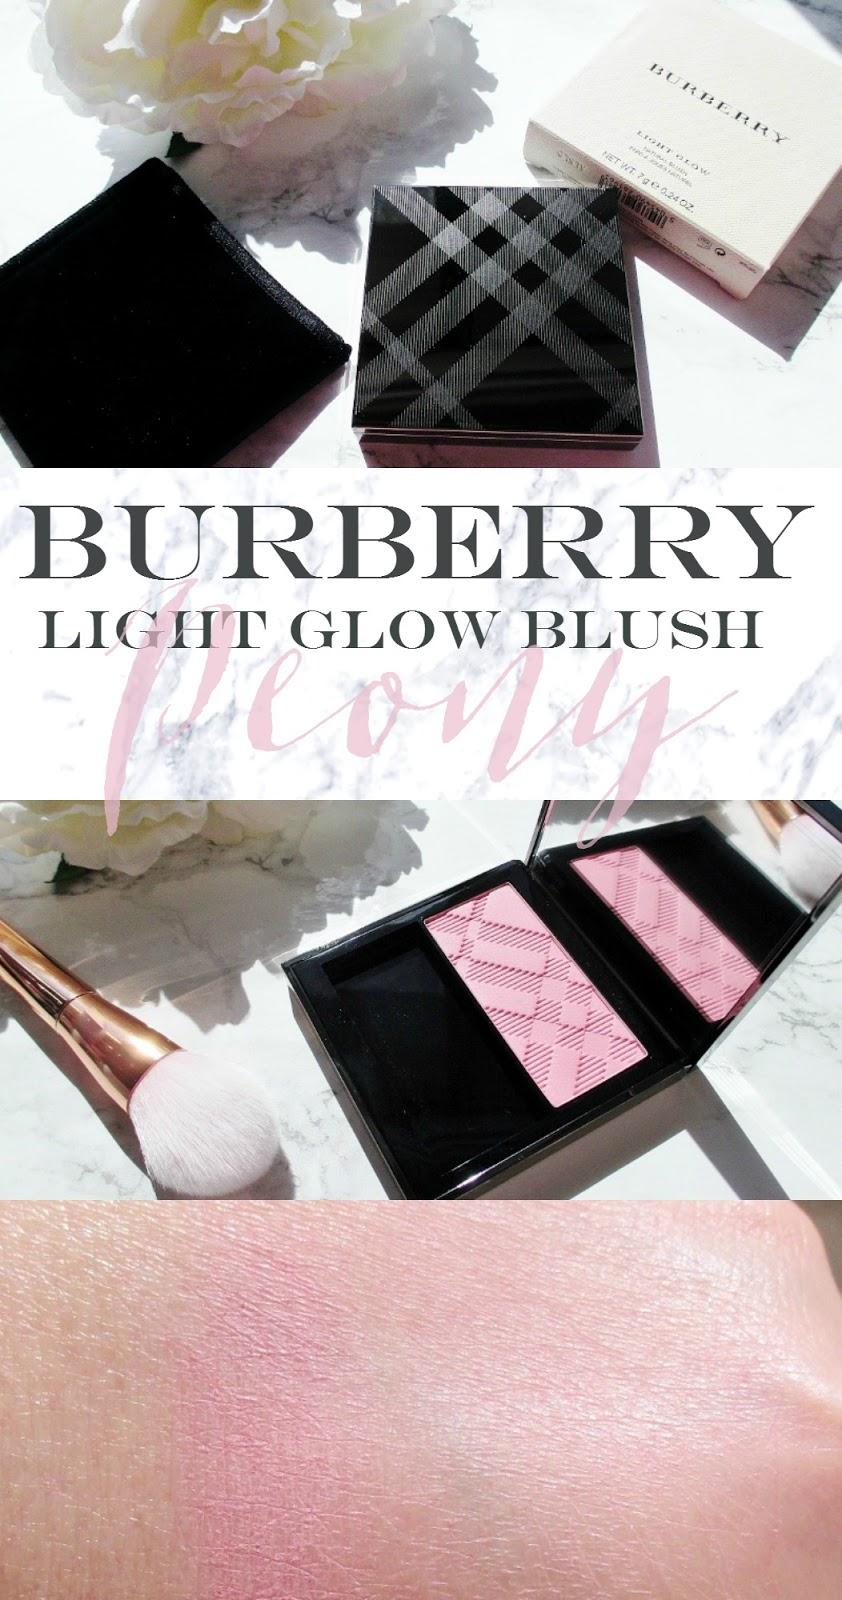 burberry-light-glow-blush-peony-3